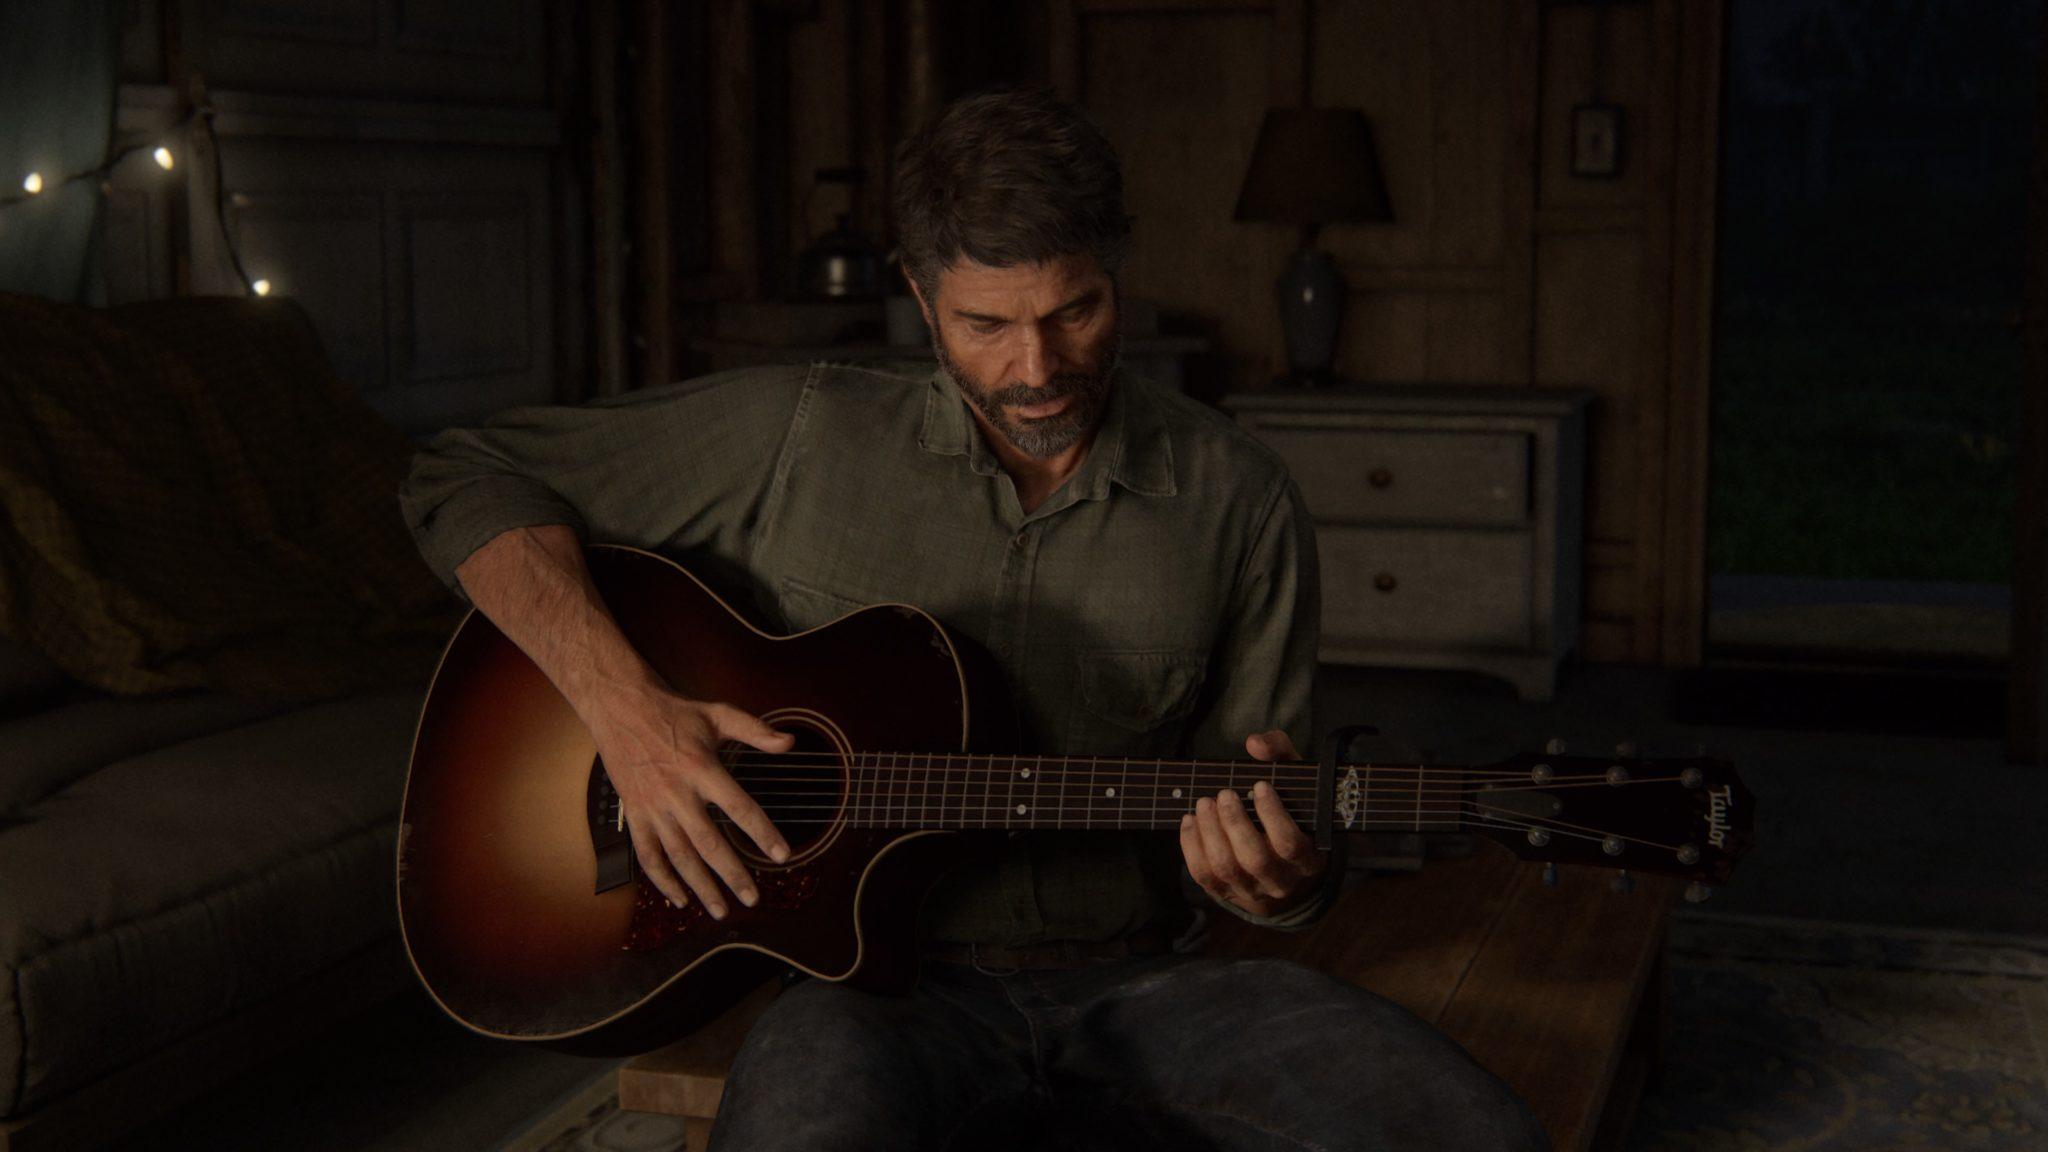 Joel dans The Last of Us Part II